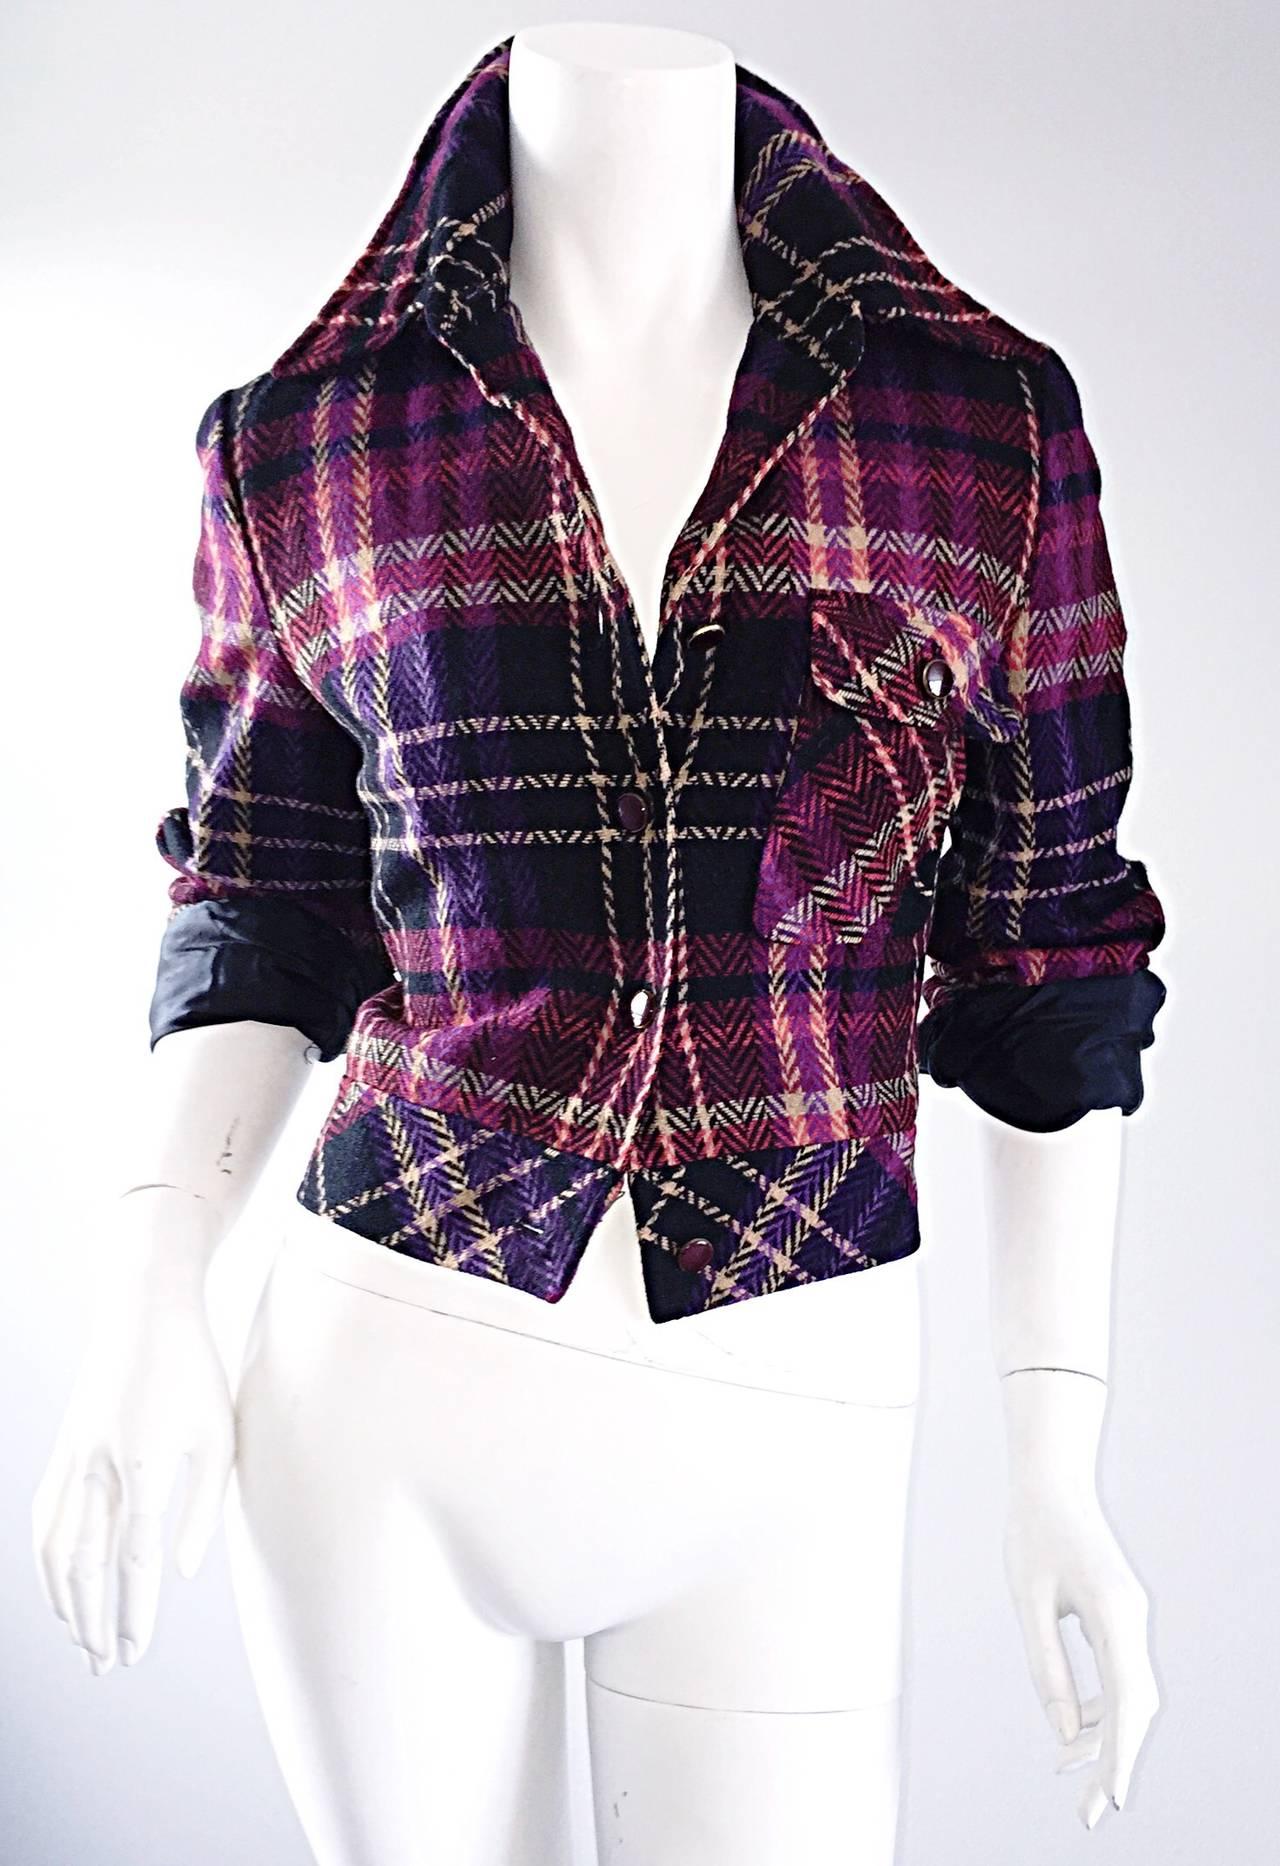 1970s Vintage Addena for I. Magnin Pink + Purple Plaid Herringbone Wool Jacket 5